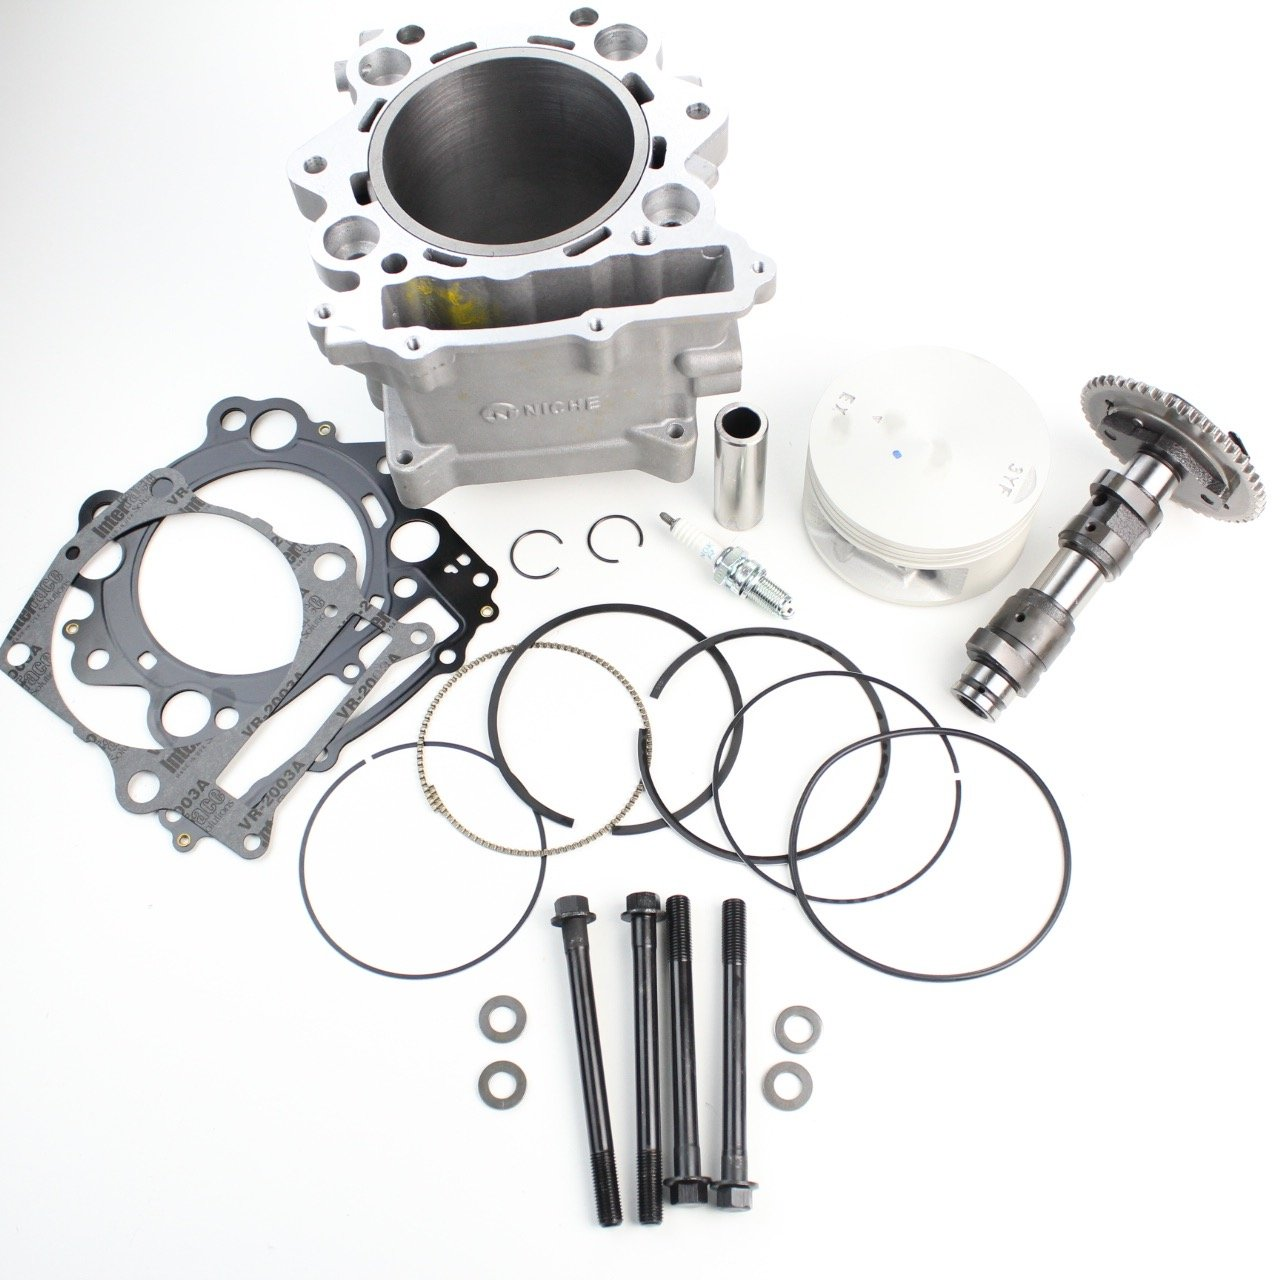 Niche Industries 1914 Yamaha Rhino 660 Cylinder Camshaft Piston Gasket Top End Kit 2004-2007